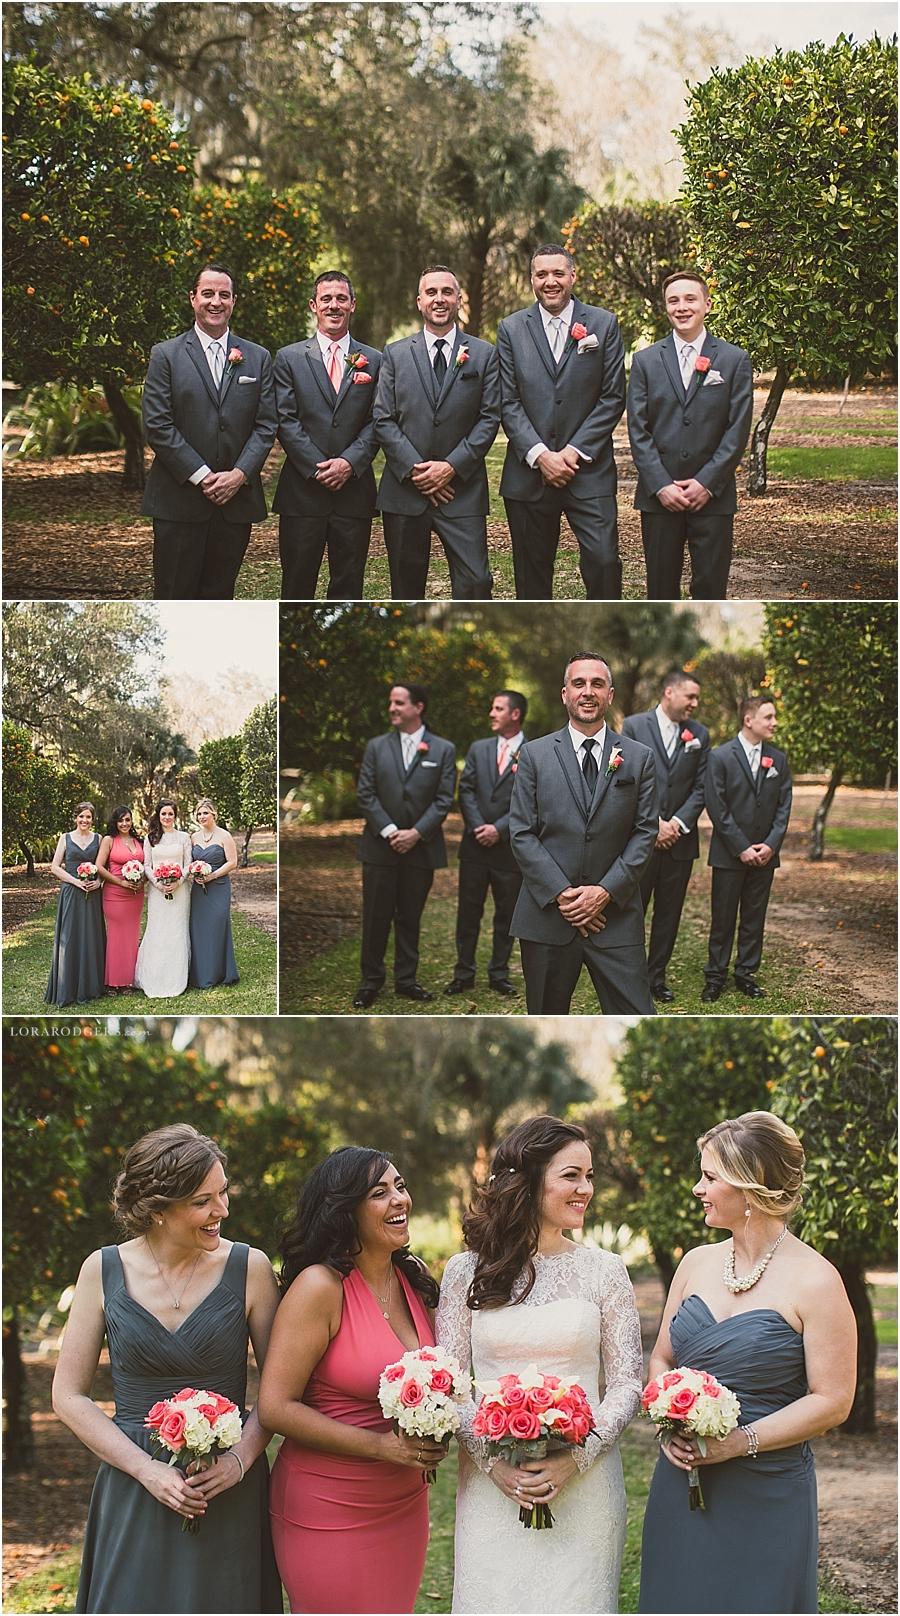 Bok_Towers_Orlando_Florida_Wedding_006